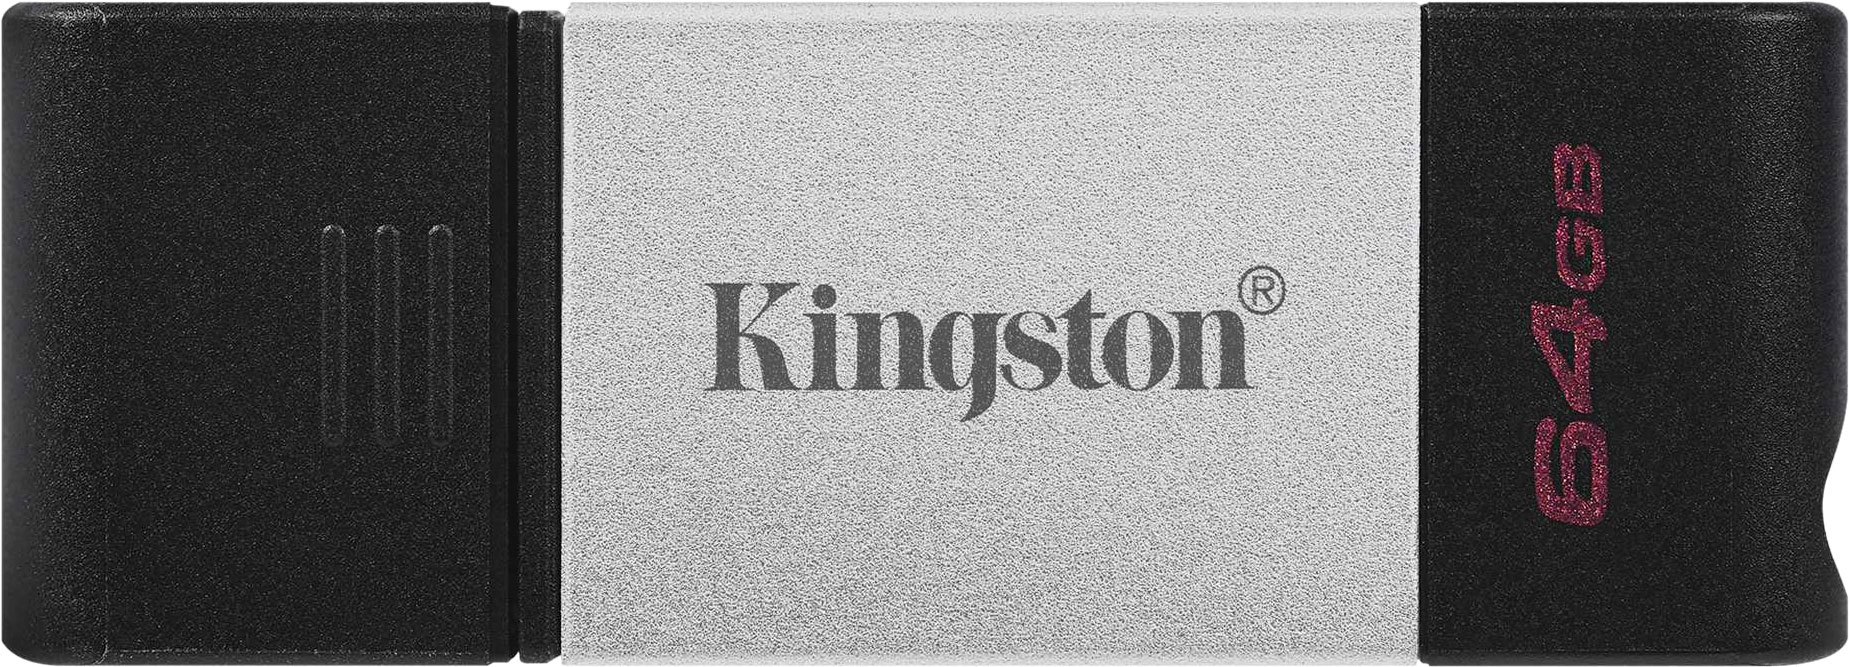 Флеш-накопитель Kingston DataTraveler 80 OTG USB Type-C, 64 ГБ